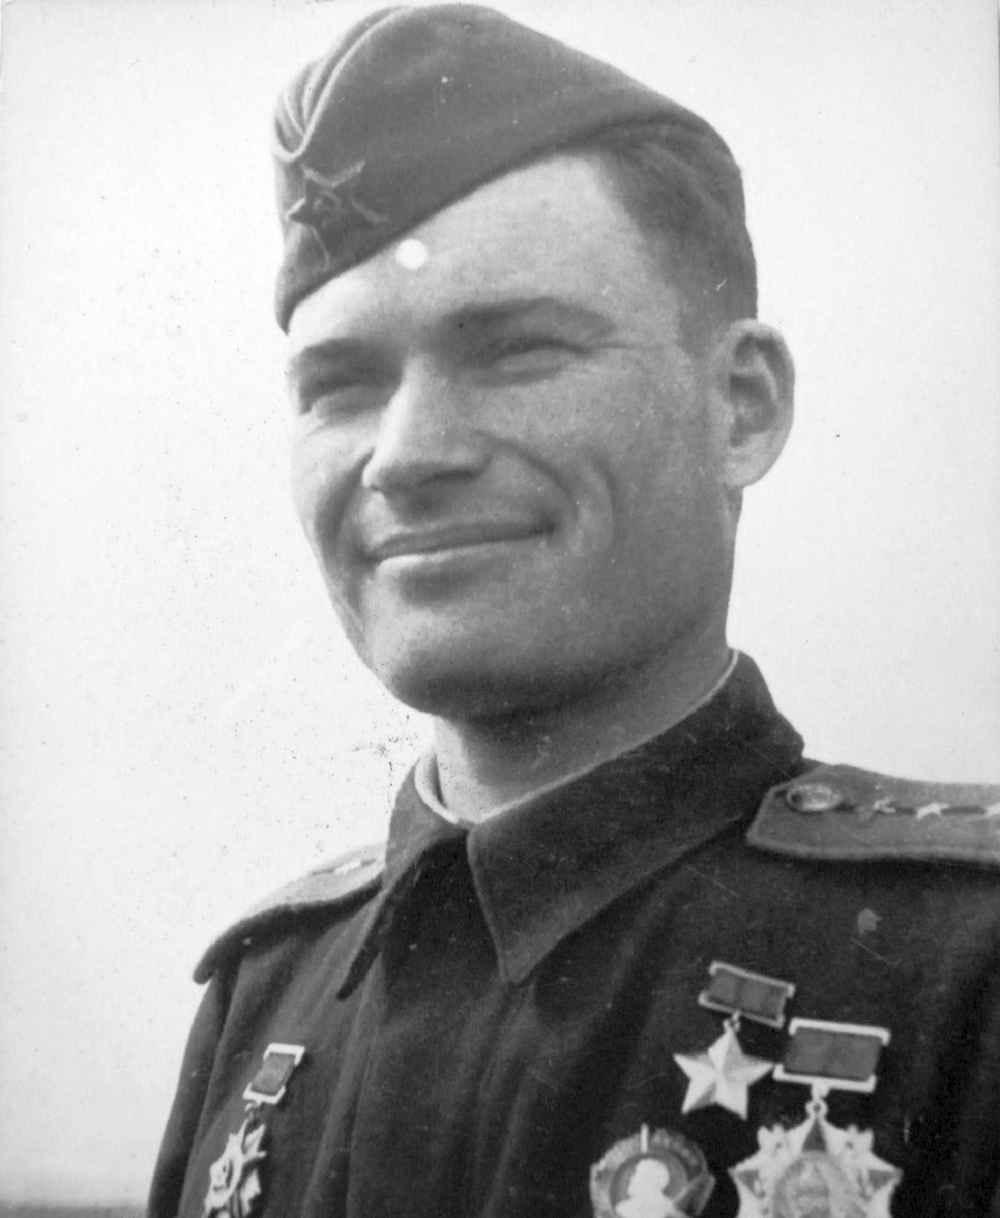 Герой Советского Союза капитан Н.М. Карабулин